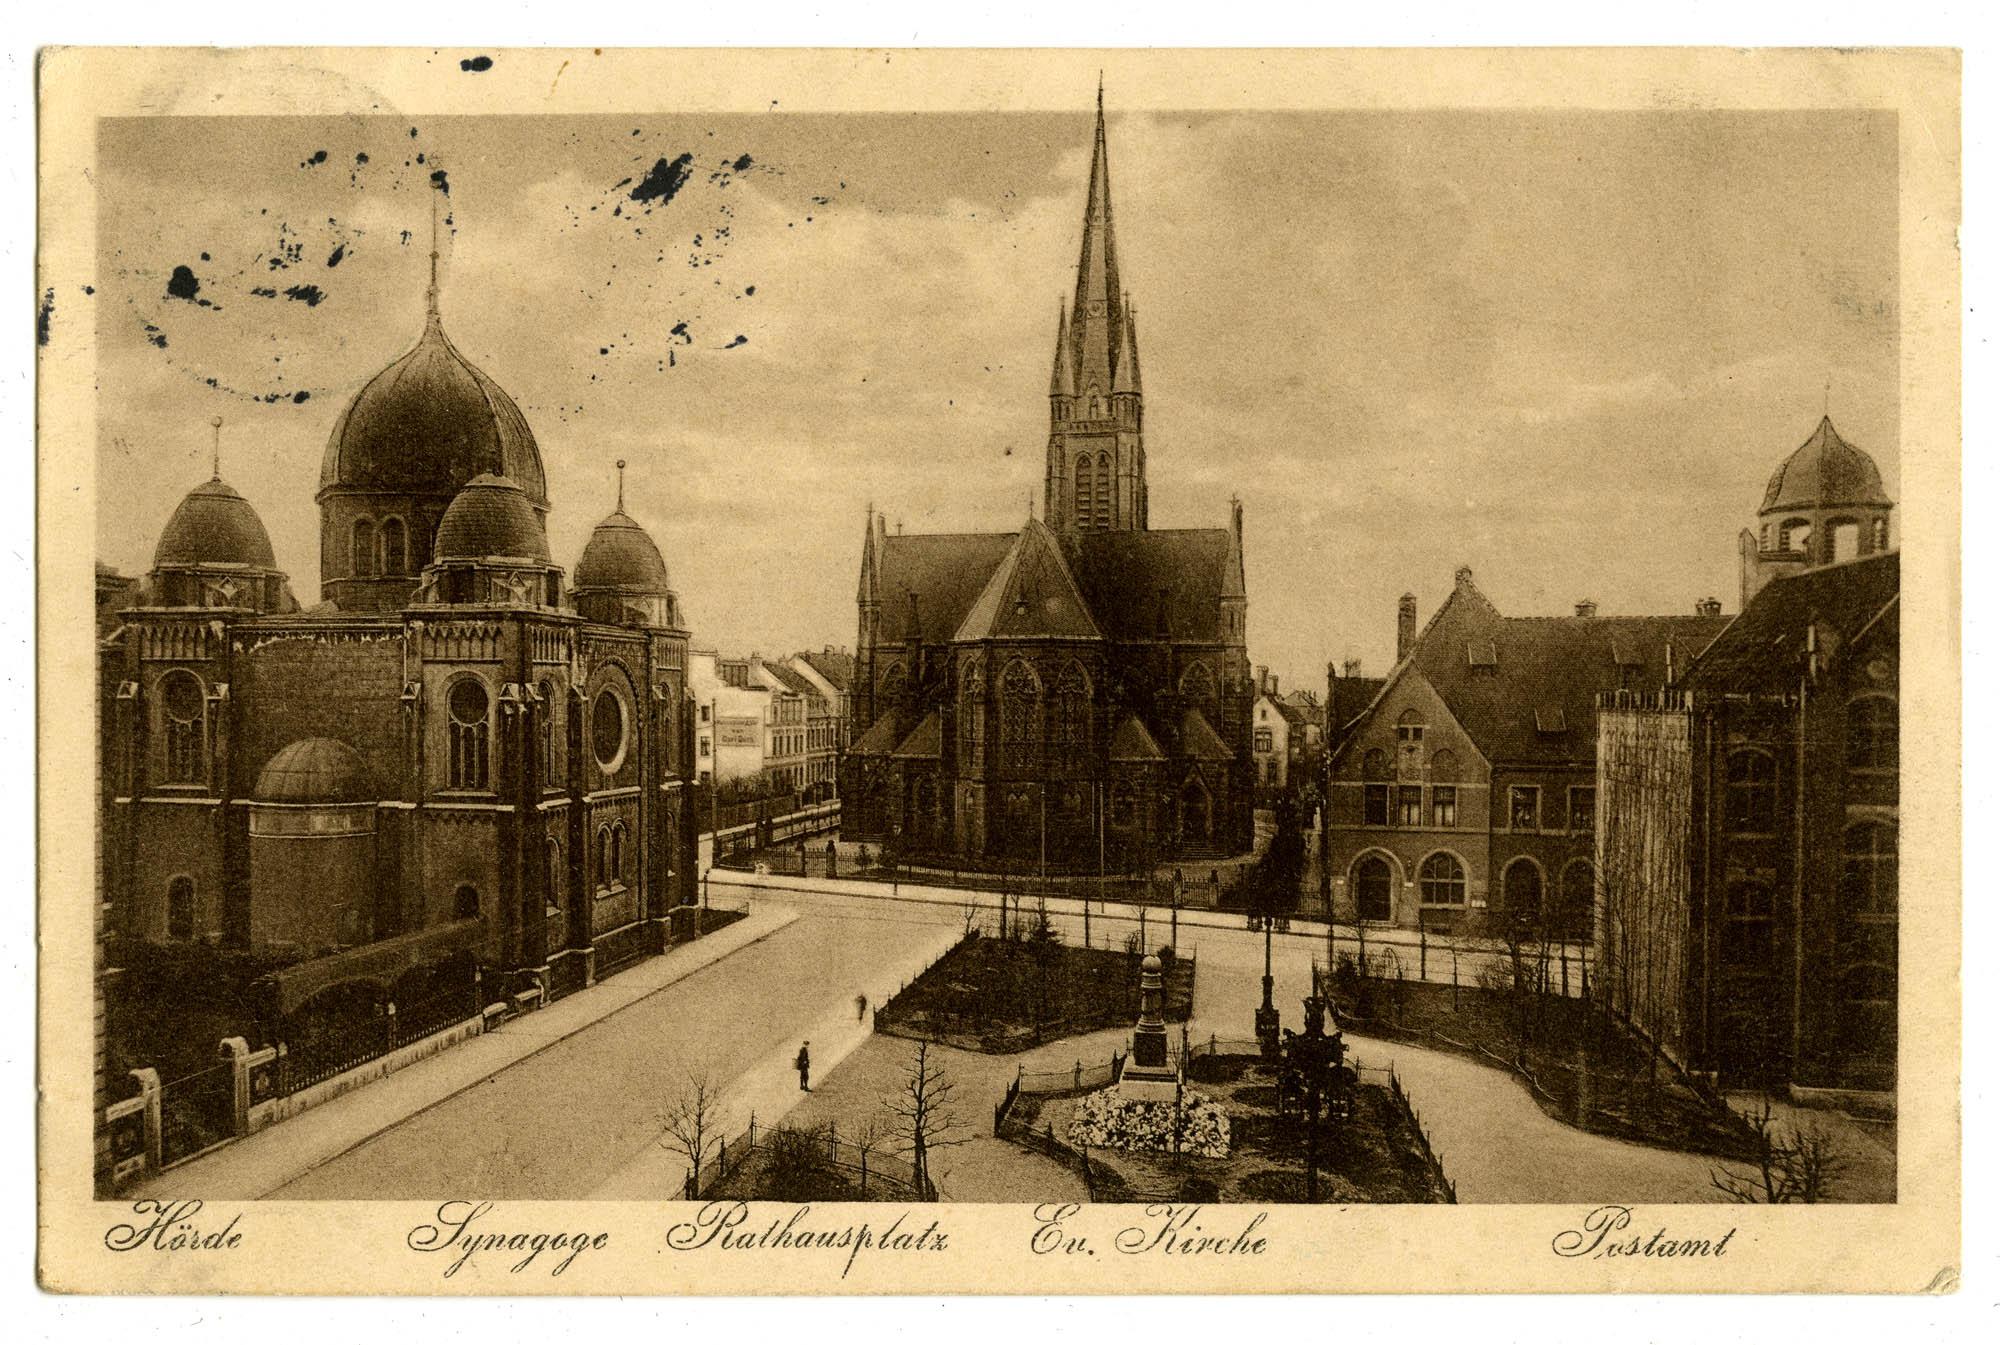 Hörde. Synagoge. Rathausplatz. Ev. Kirche. Postamt.